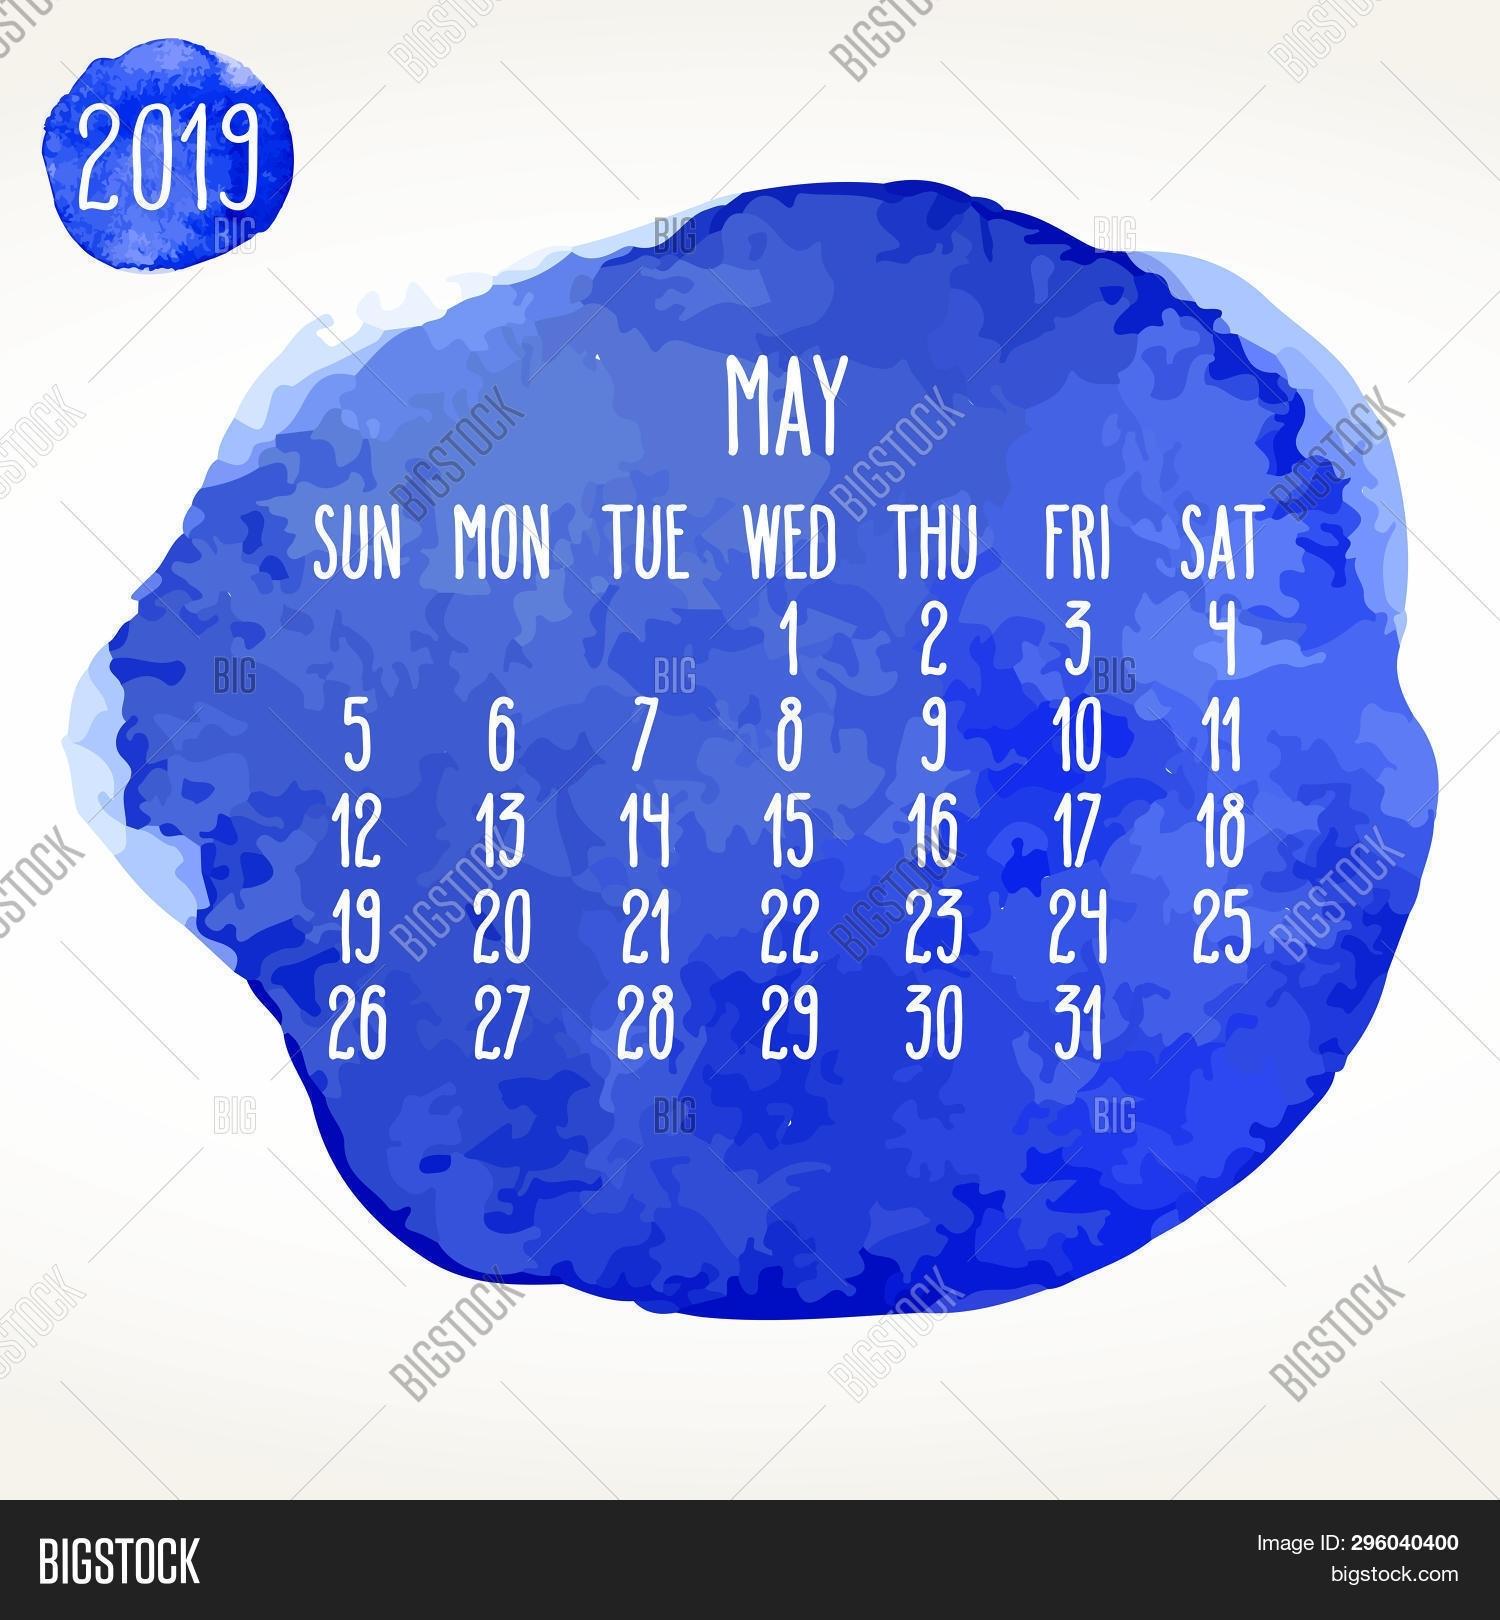 May Year 2019 Vector Vector & Photo (Free Trial) | Bigstock